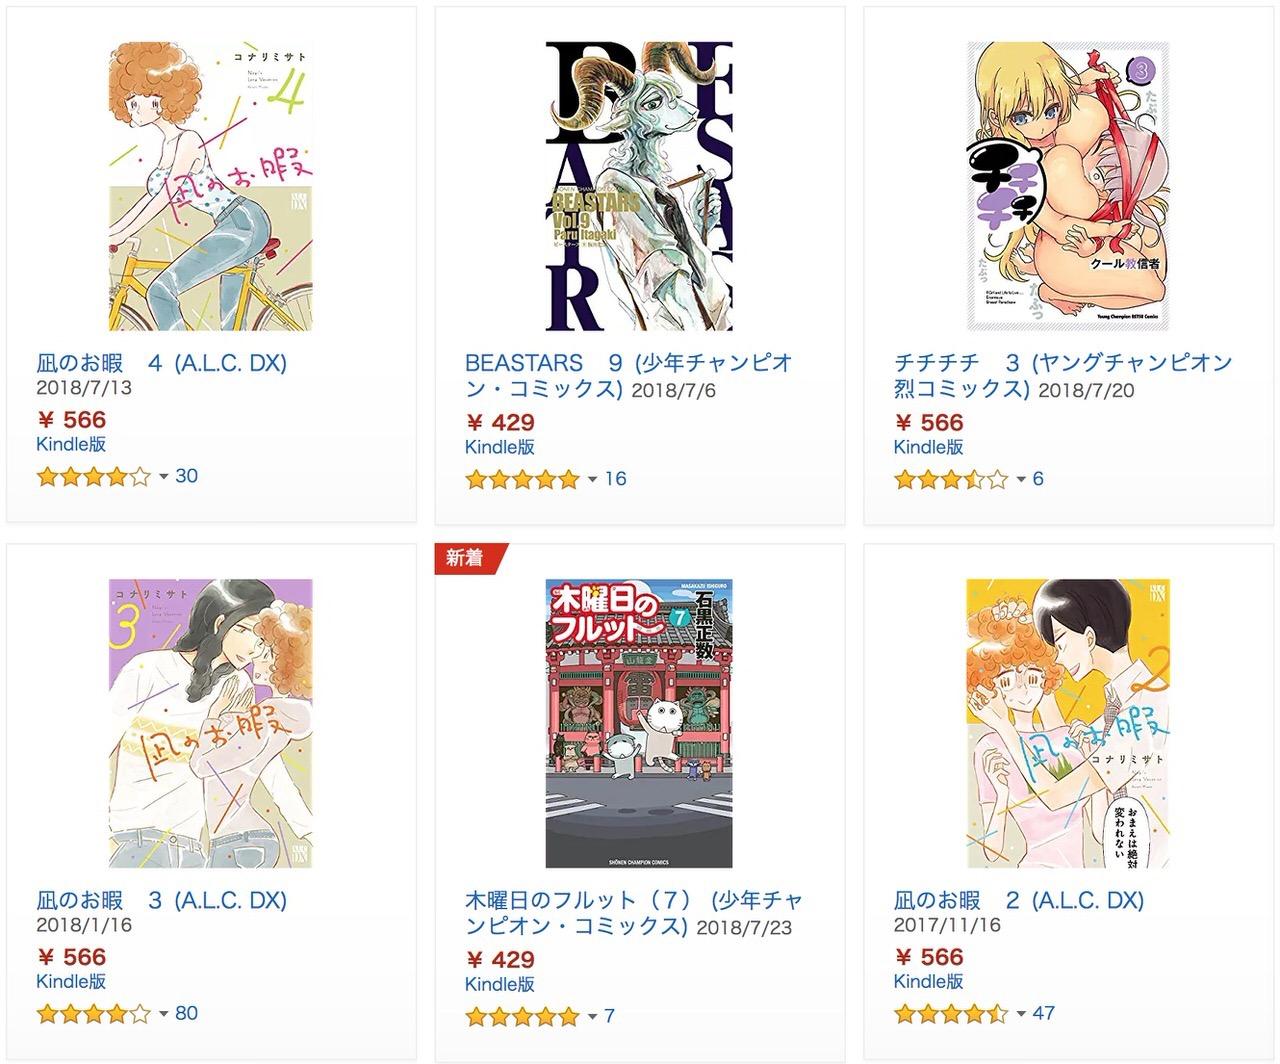 【Kindleセール】「50%ポイント還元 秋田書店セール<対象タイトル8,000点以上>」(8/16まで)